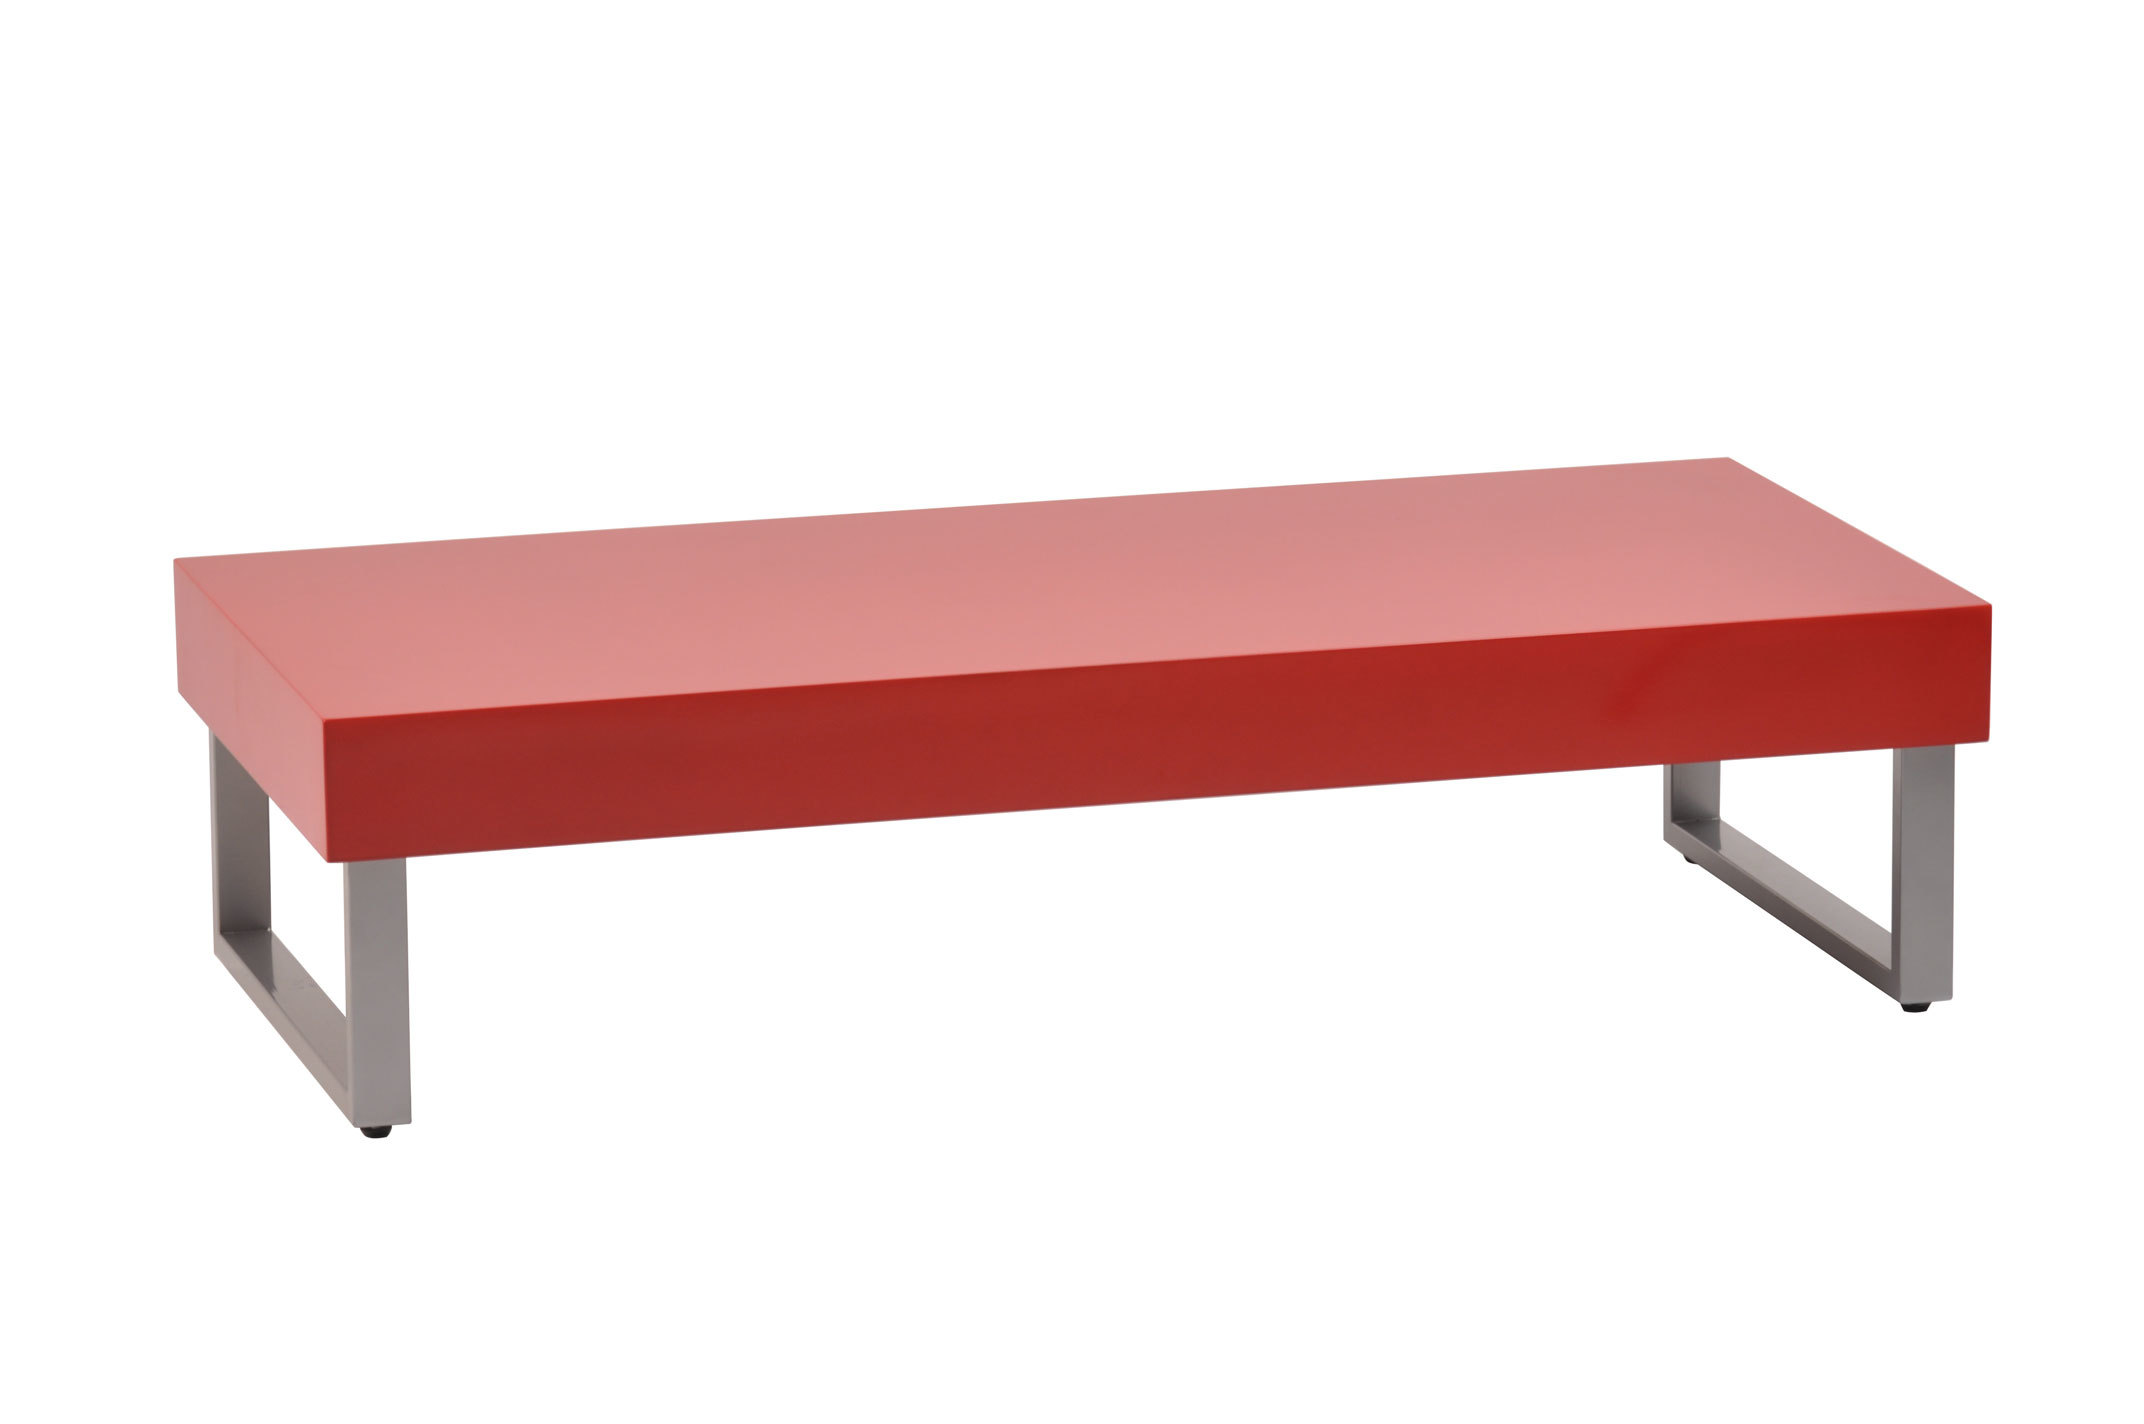 Table basse rouge laqu e morgan miliboo for Miliboo table basse